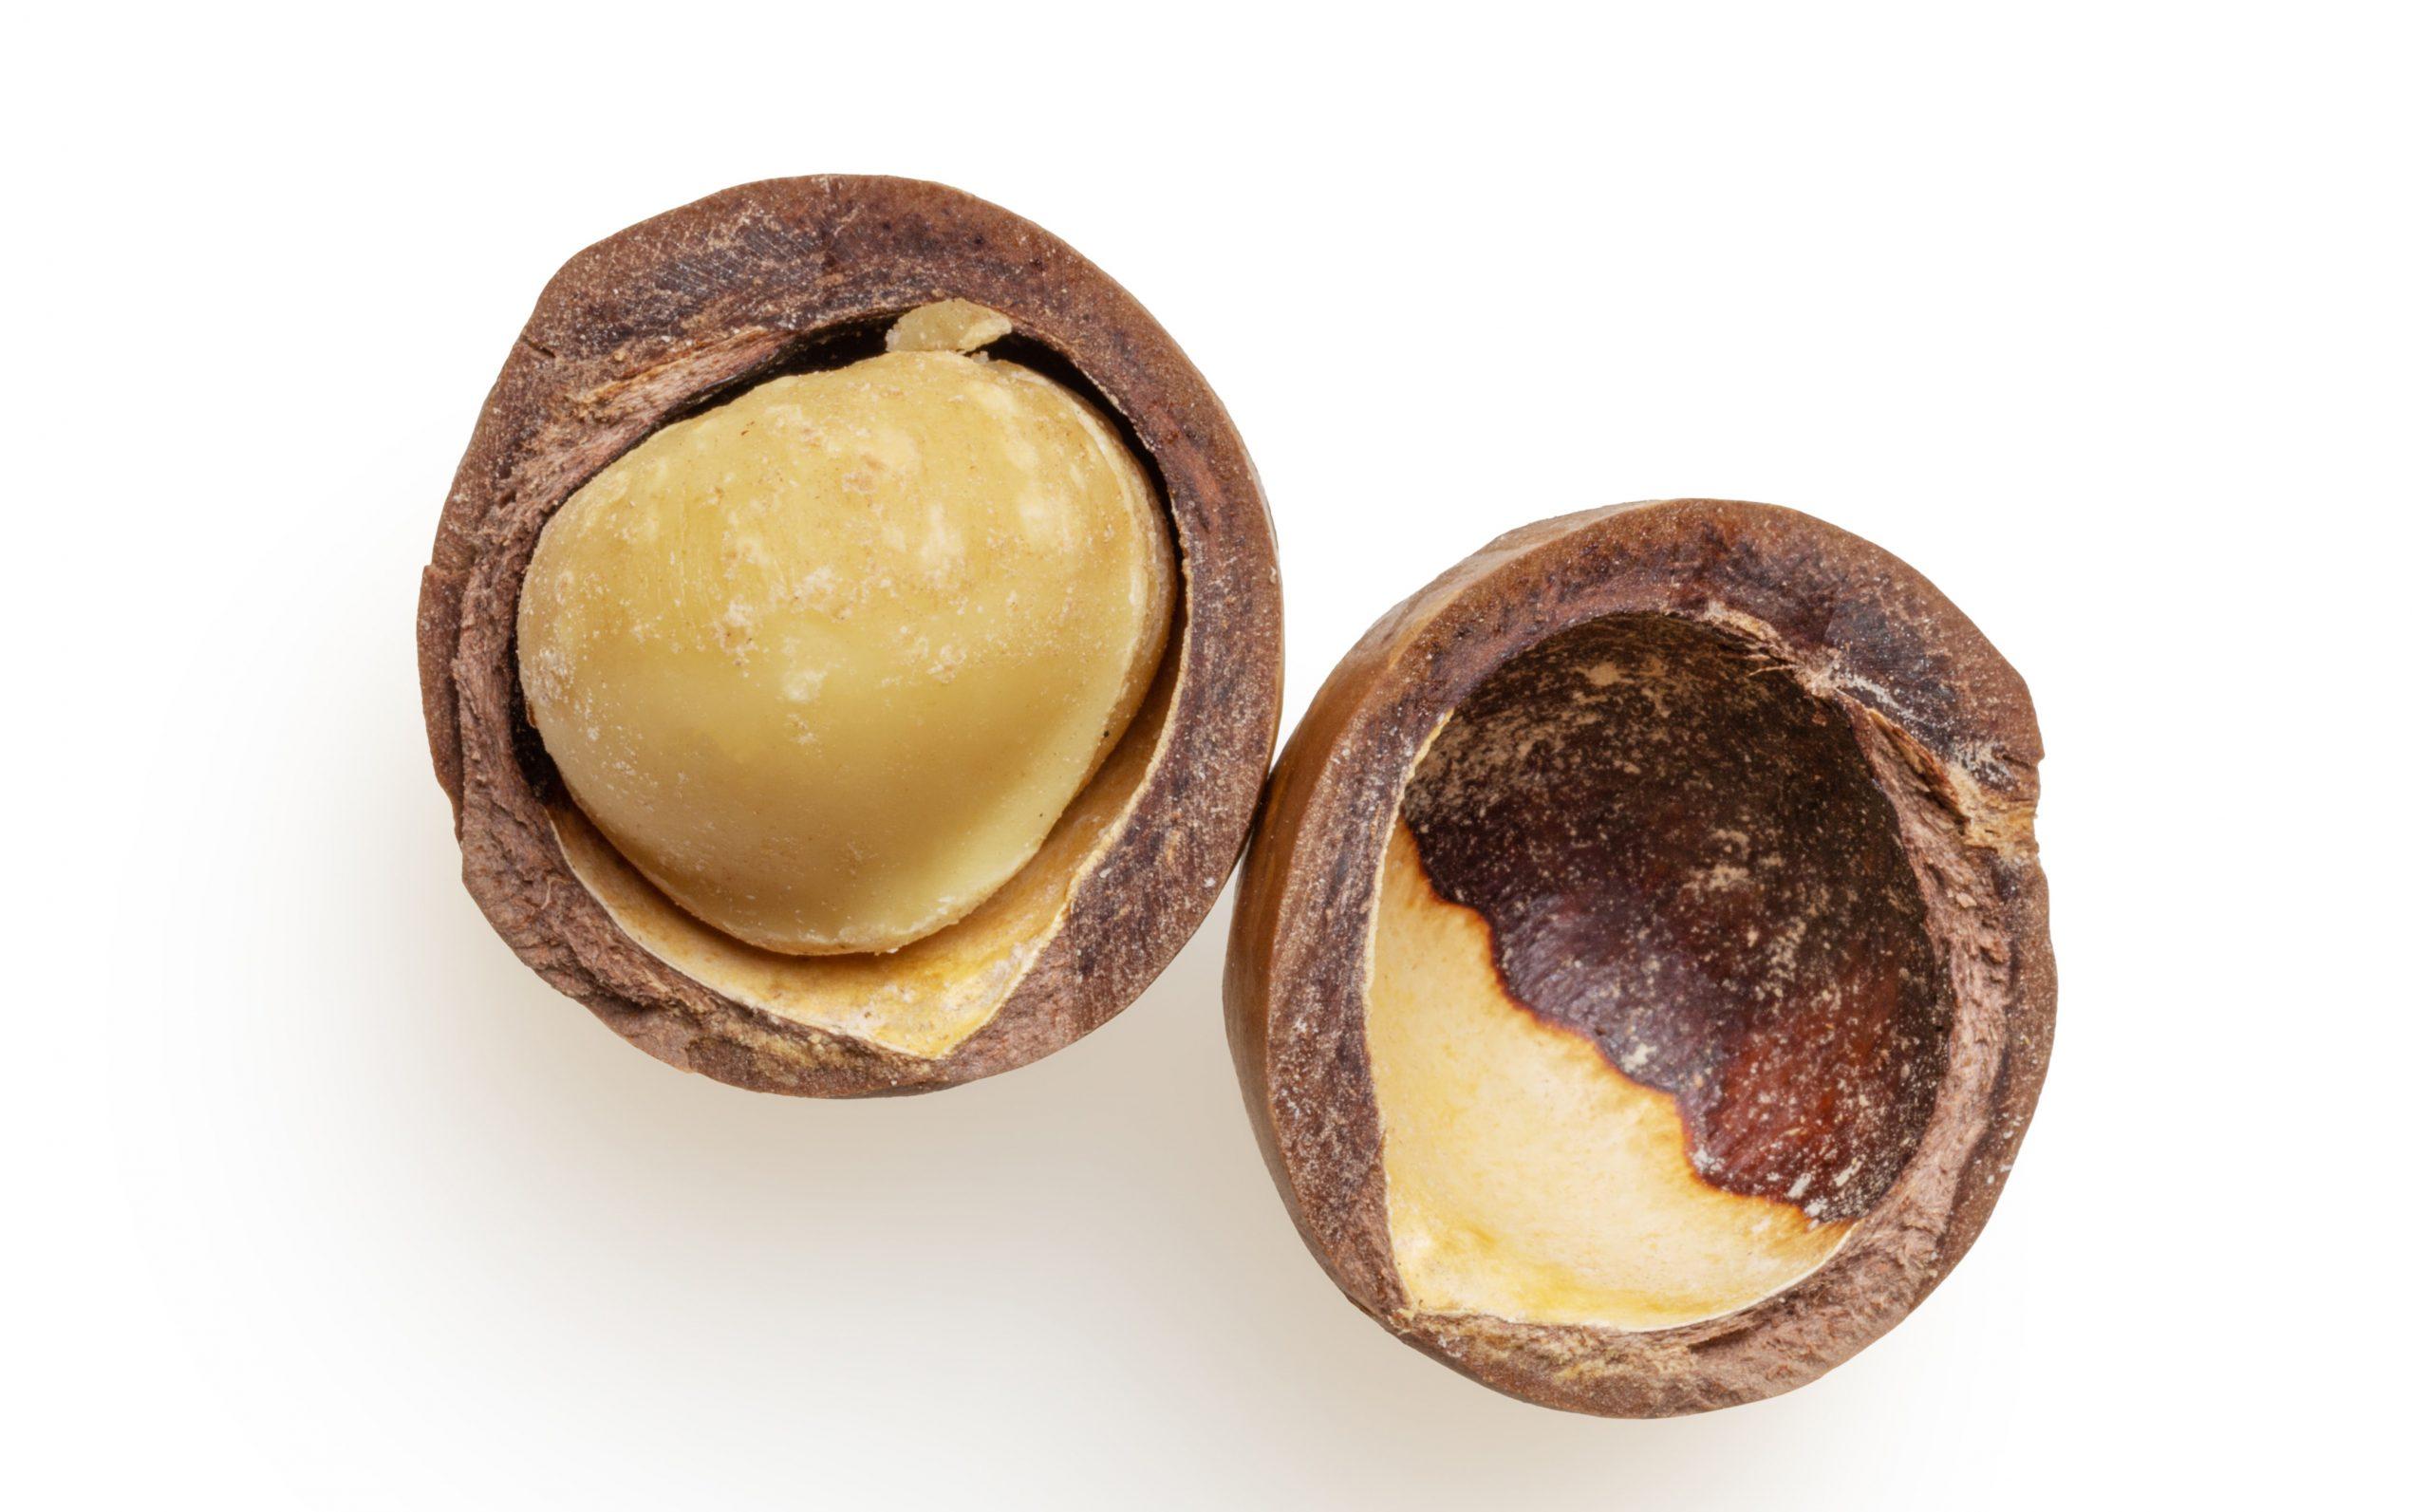 20 Foods Harmful to Dogs - macadamia nuts